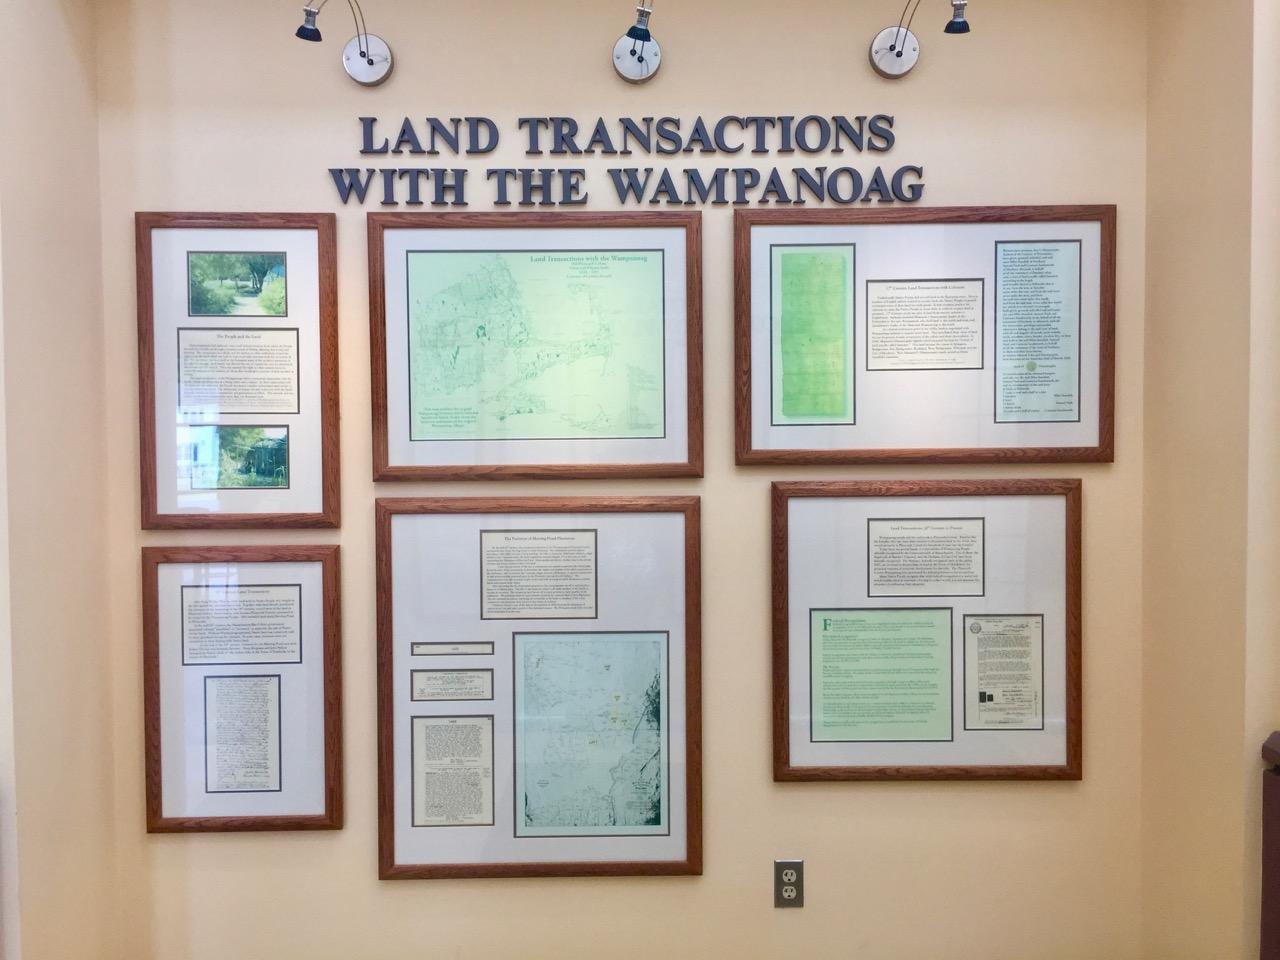 LandTransactionsWampanoagPlymouthRegistry - 1.jpg